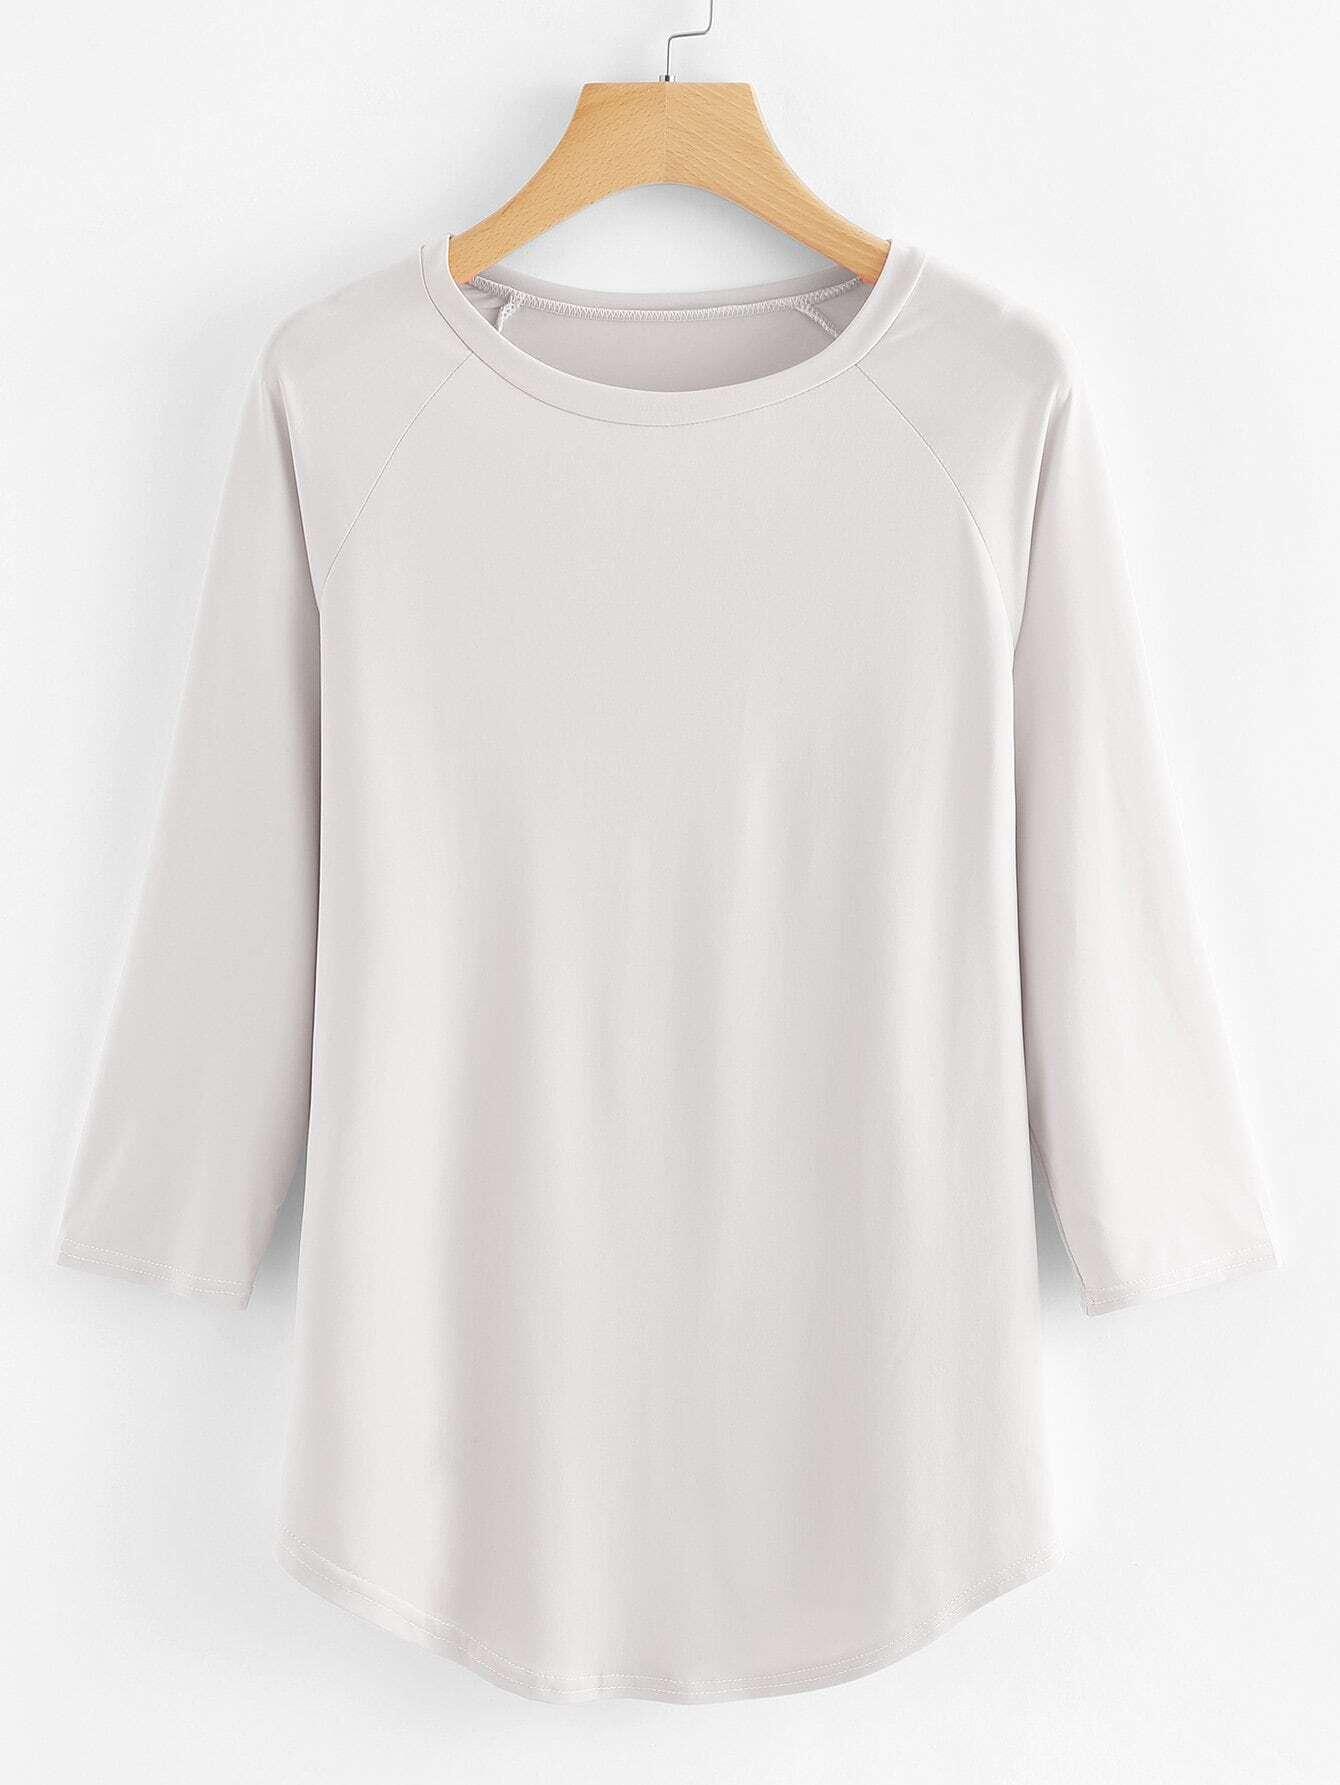 Raglan Sleeve Curved Hem T-shirt batwing sleeve pocket side curved hem textured dress